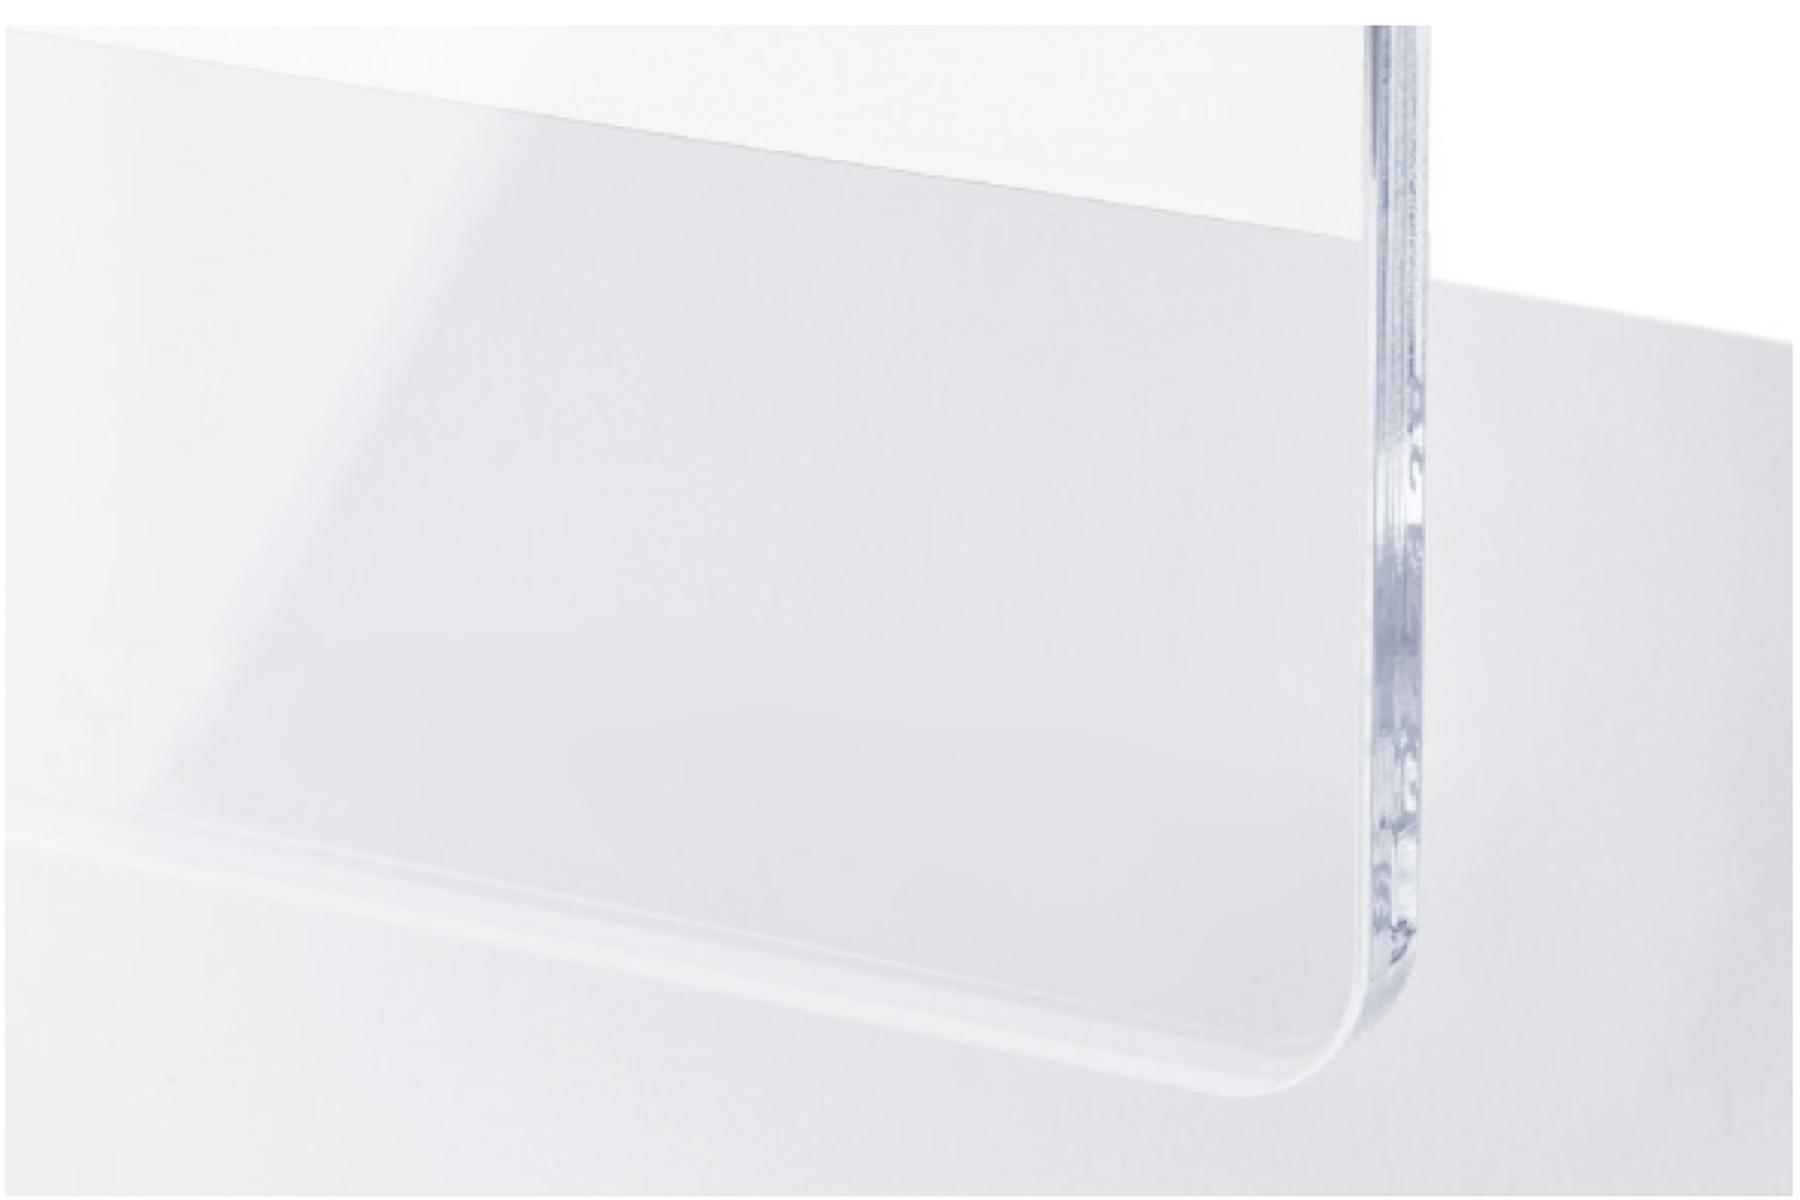 TroGlass Clear Cast Acrylic 10mm